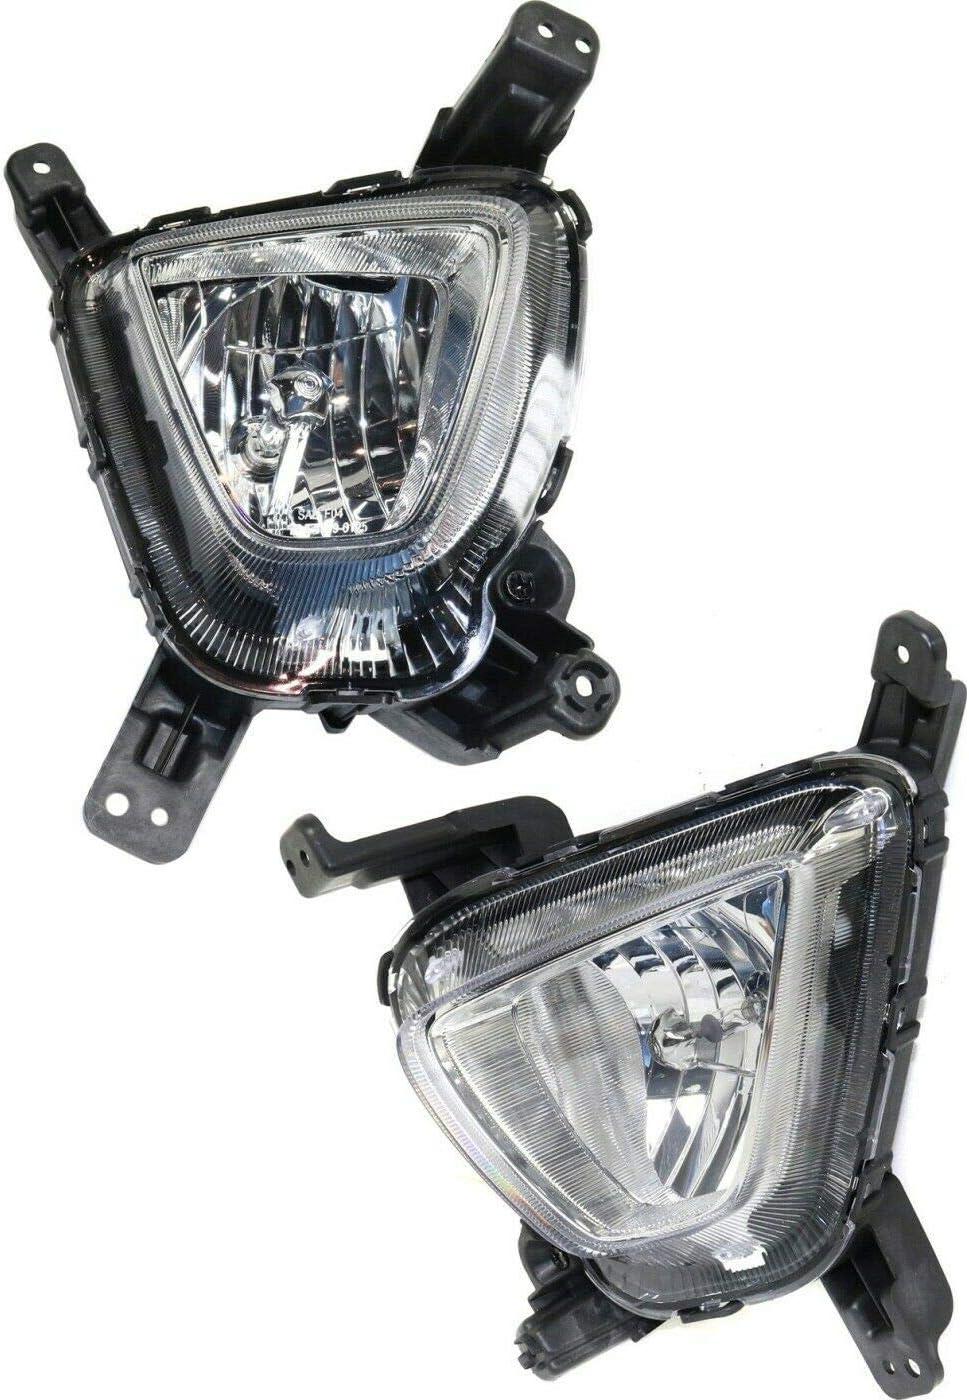 YHA Oklahoma City Mall 13462483 2pcs Clear Lens Import Fog with Sor Light Compatible 16-18